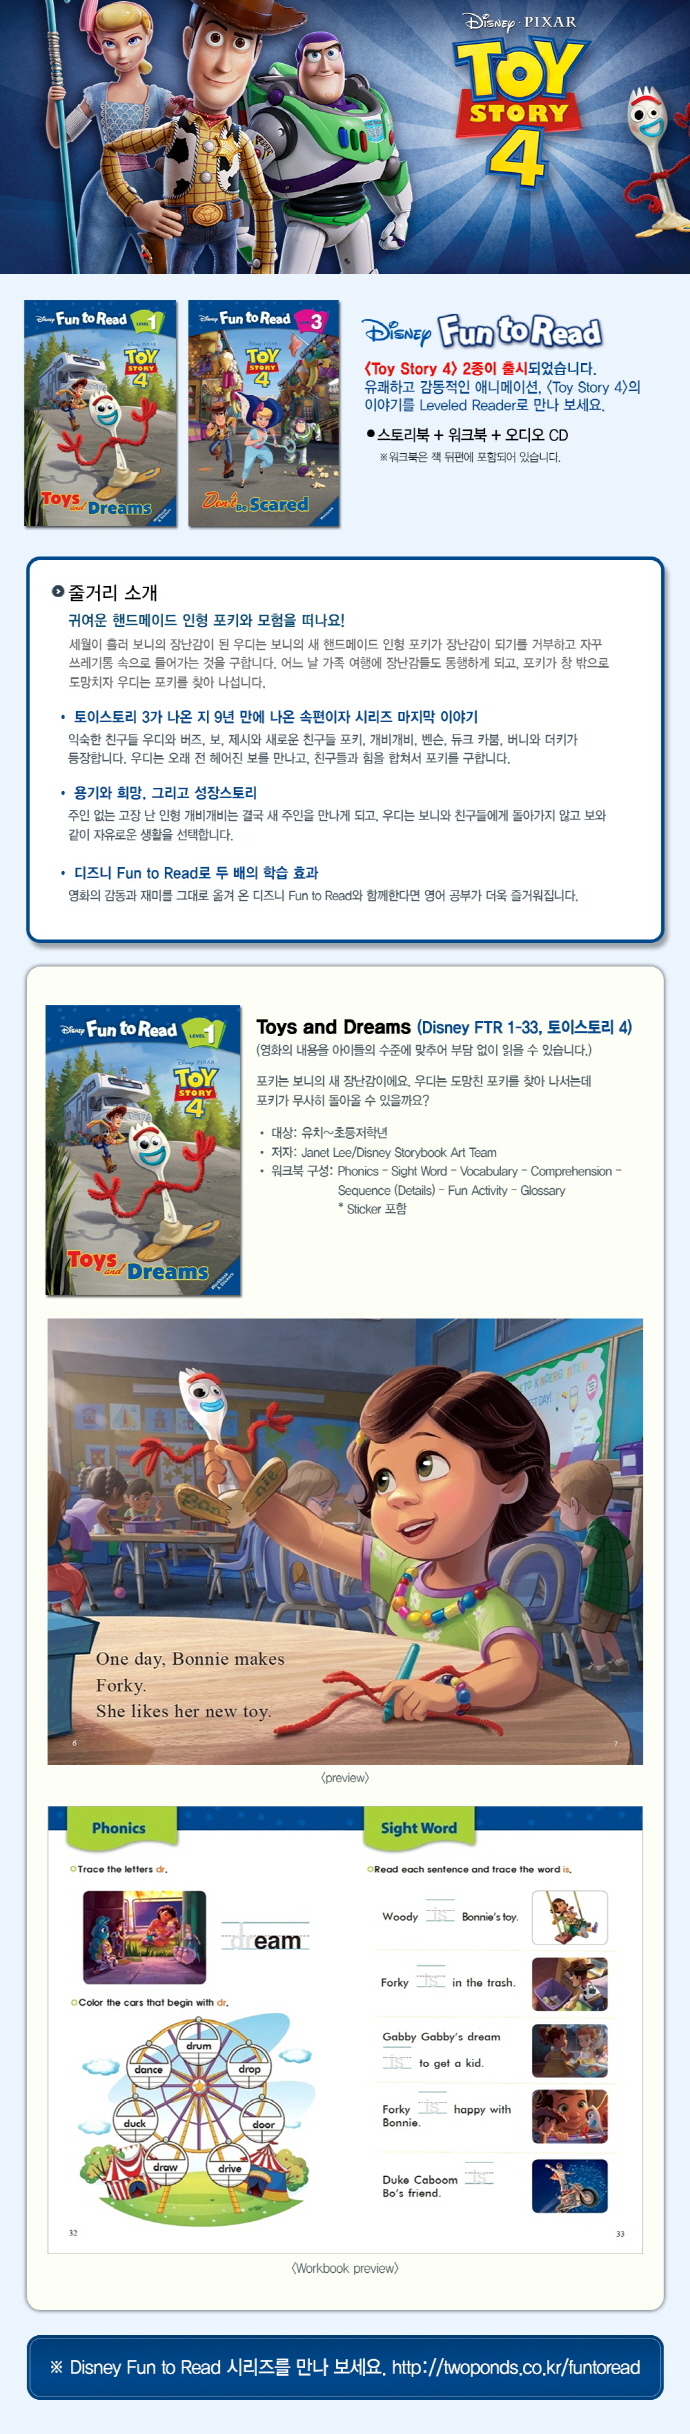 Toy story. 4: Toys and Dreams 세트(Cd1장포함)(Disney Fun to Read Level 1-33) 도서 상세이미지